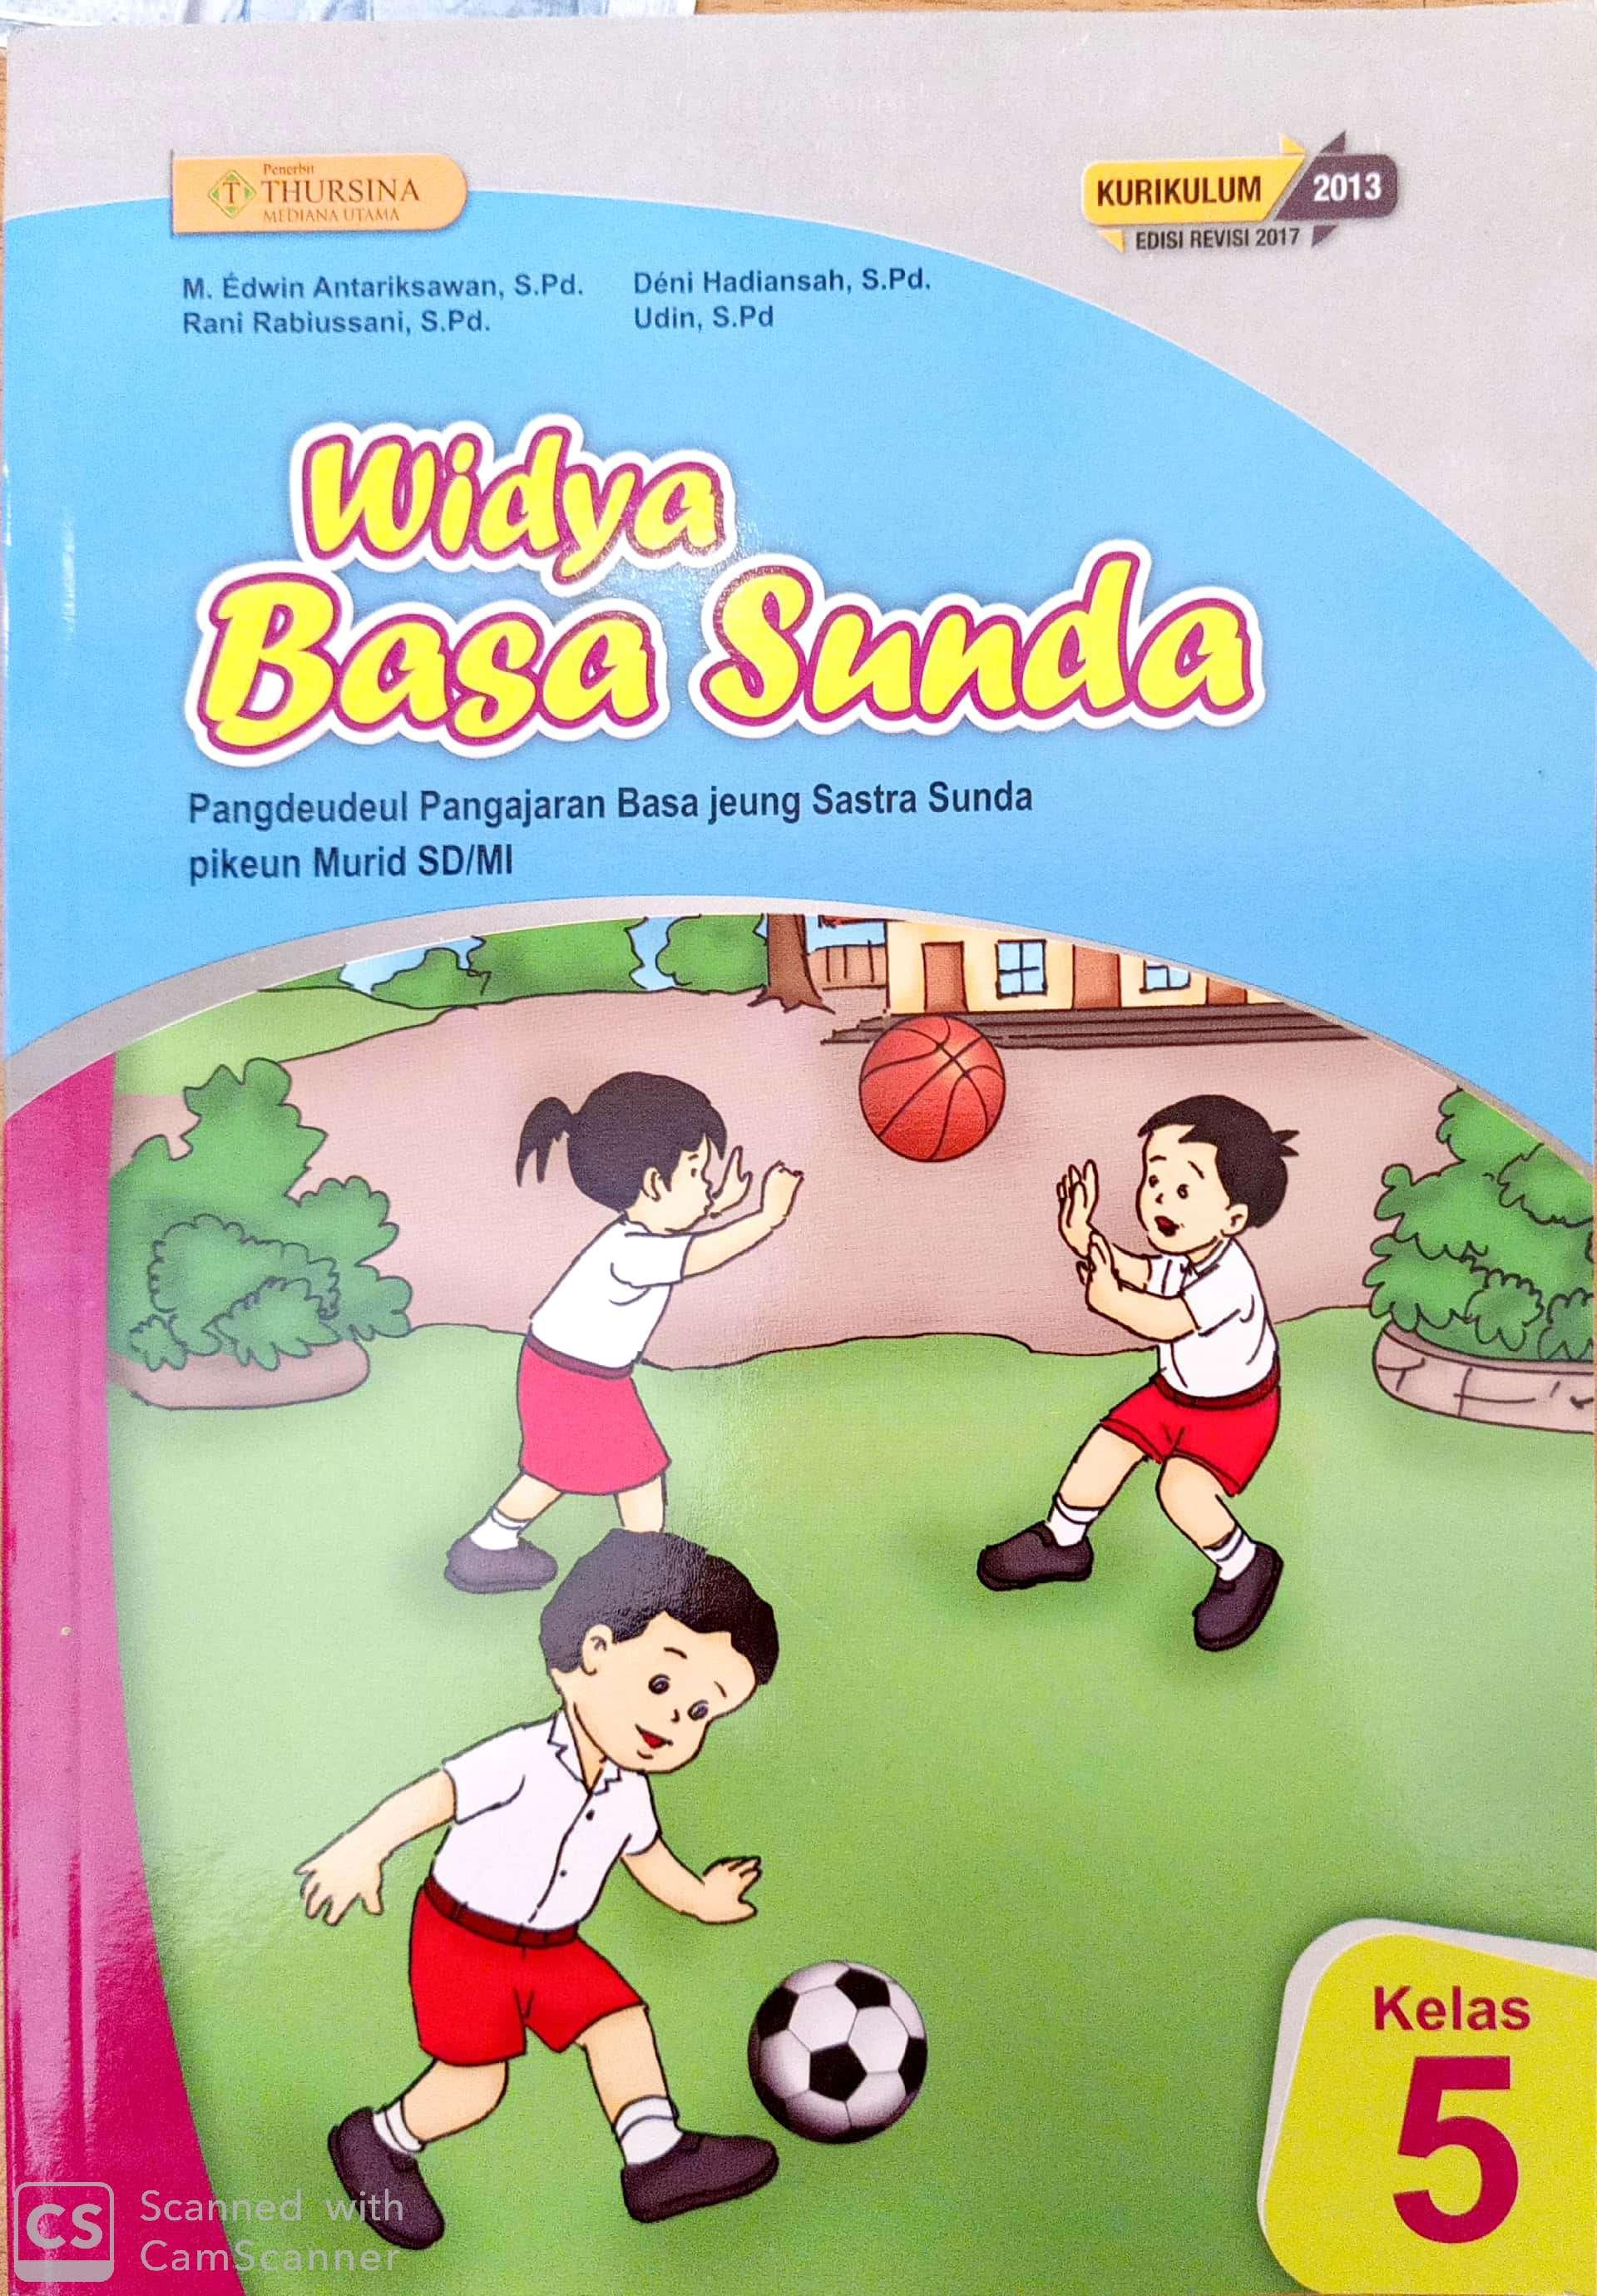 Unduh gratis buku pemahaman memahami alur perencanaan pembelajaran. Jawaban Buku Widya Basa Sunda Kelas 5 - Guru Paud